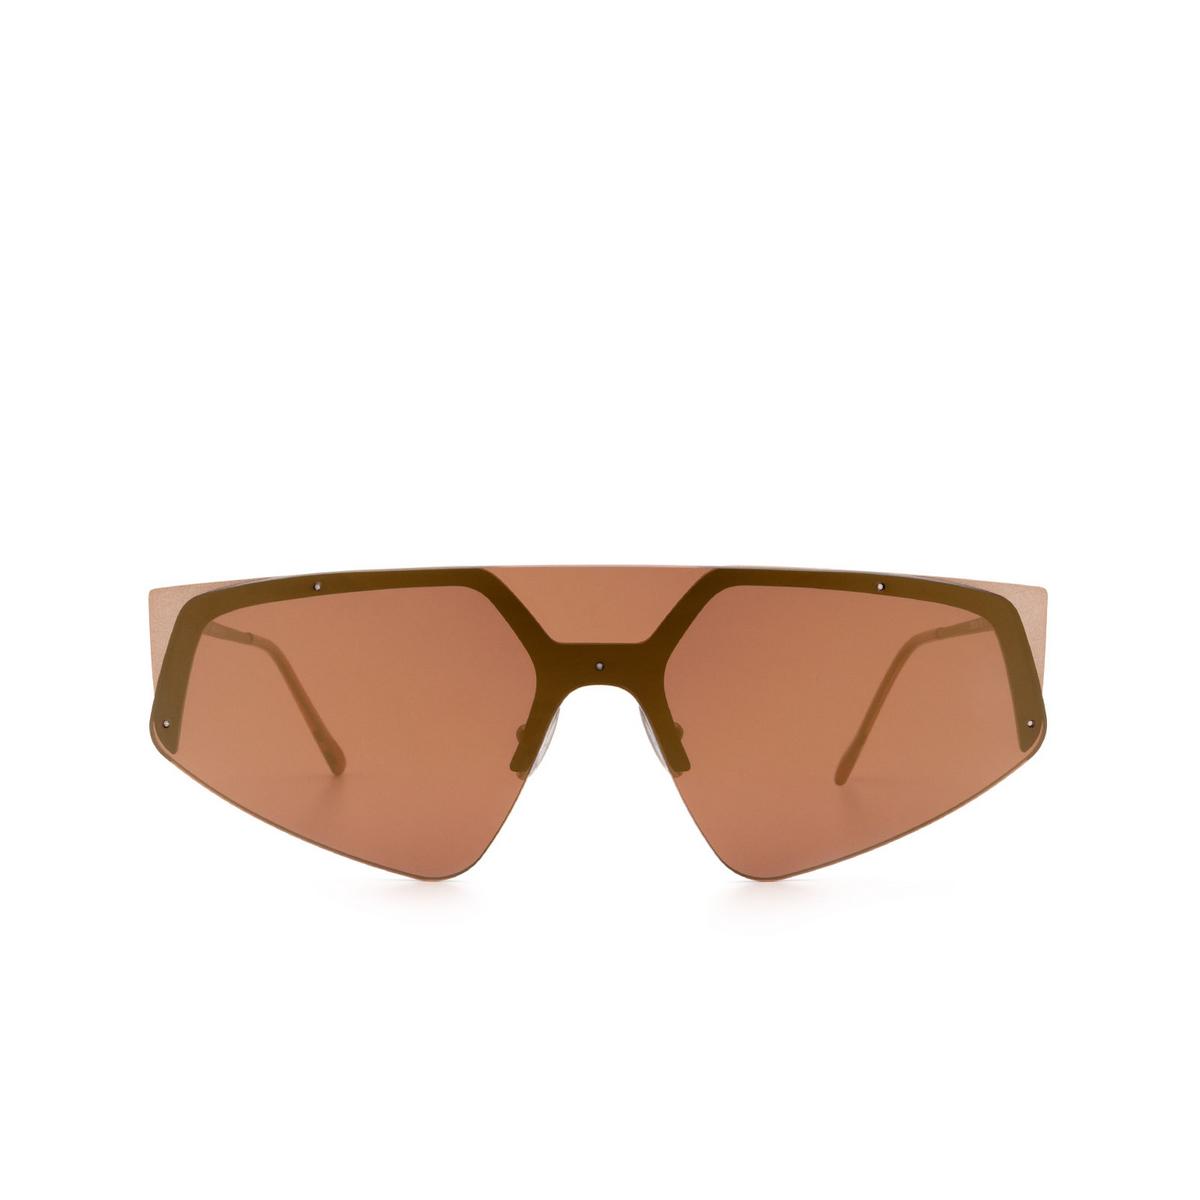 Sportmax® Mask Sunglasses: SM0034 color Bronze 38U - front view.